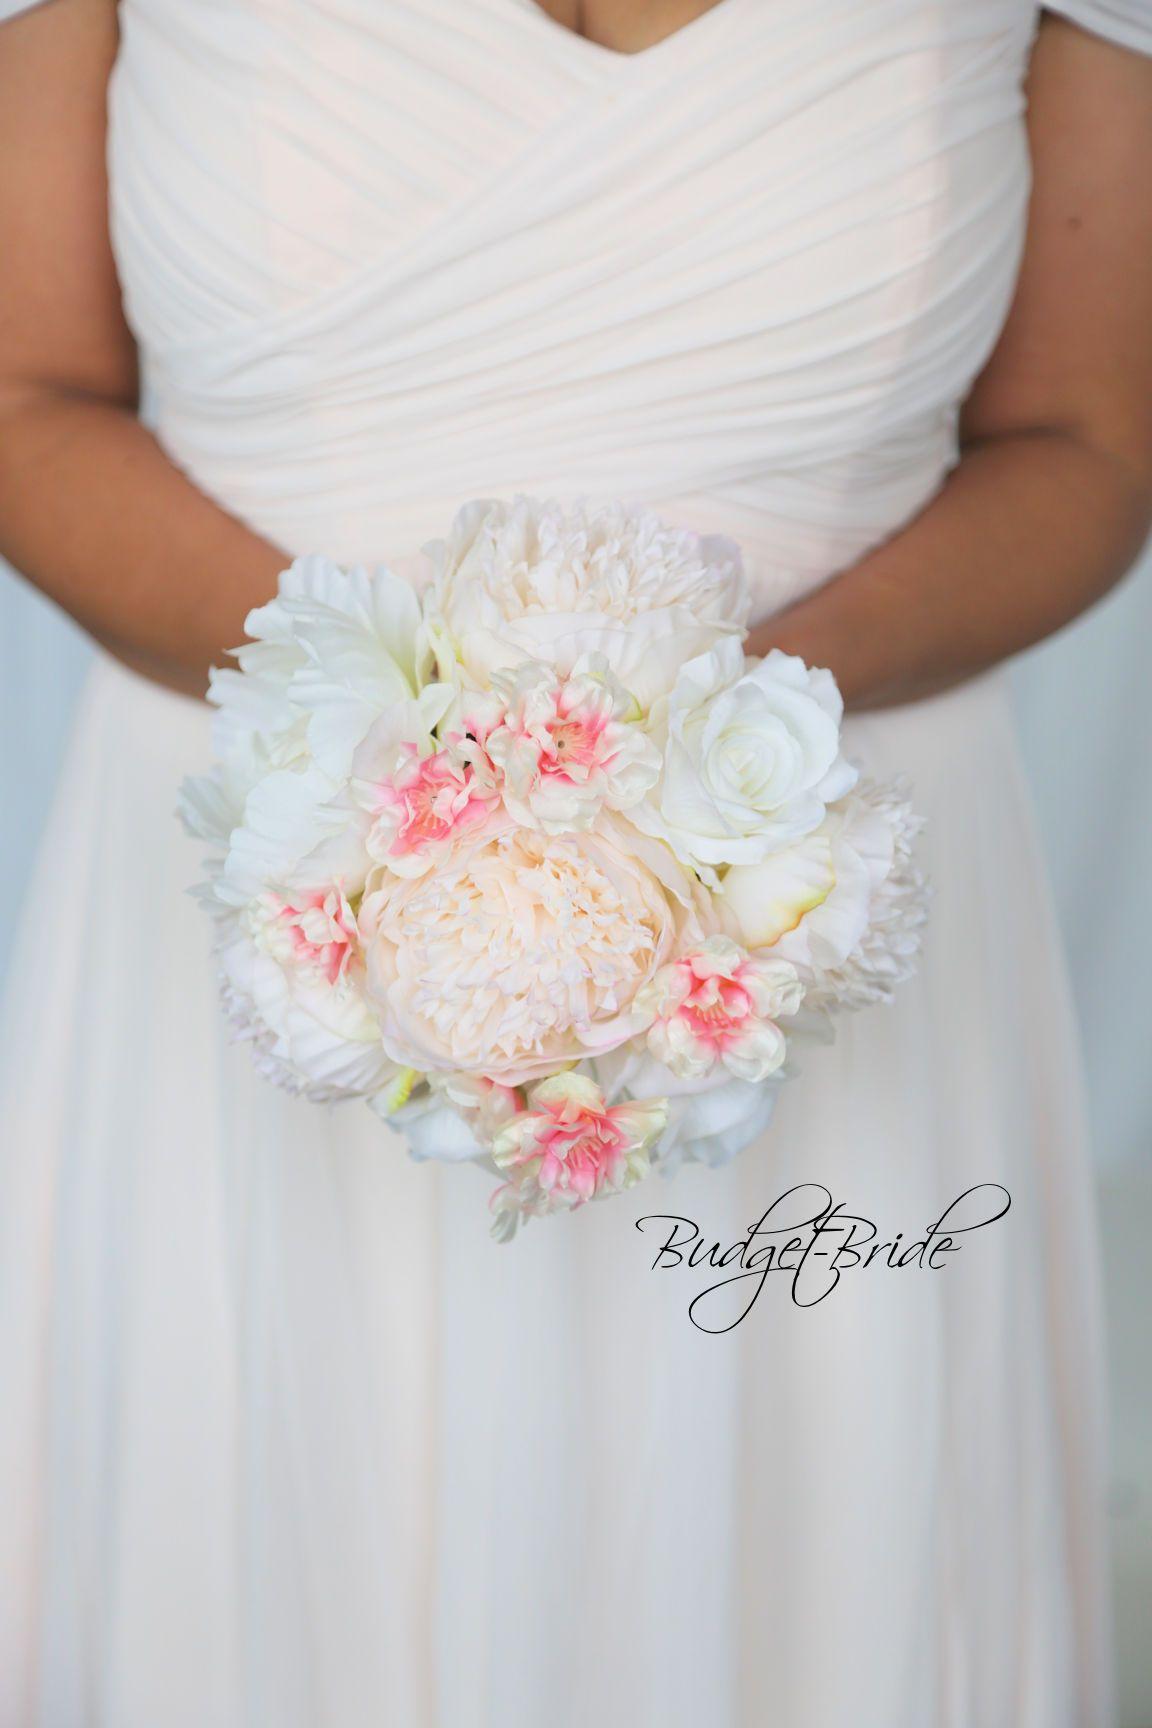 Davids Bridal Cherry Blossom Wedding Bouquet With Bellini Peach